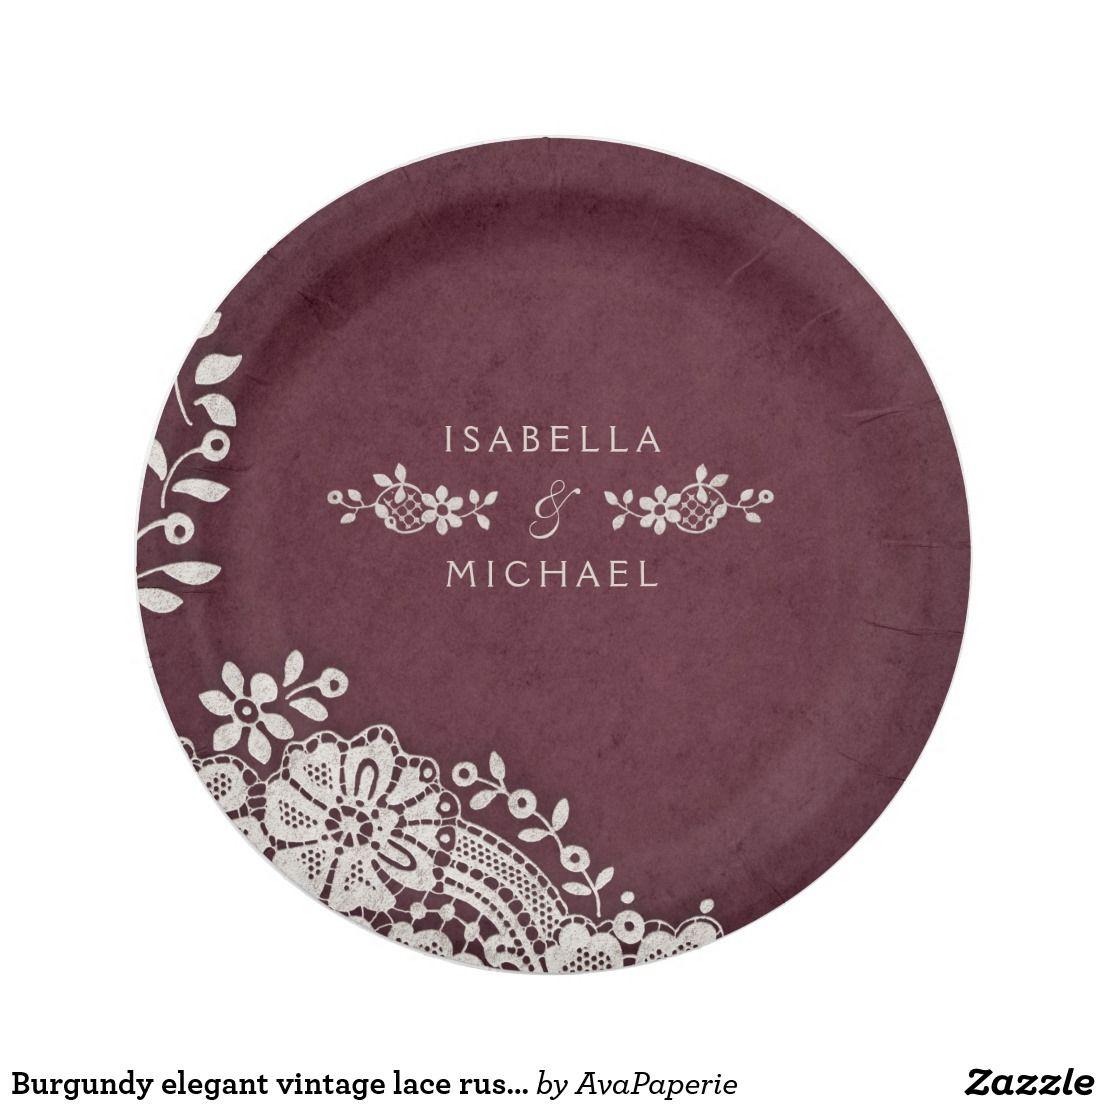 Burgundy elegant vintage lace rustic wedding paper plate | Wedding ...